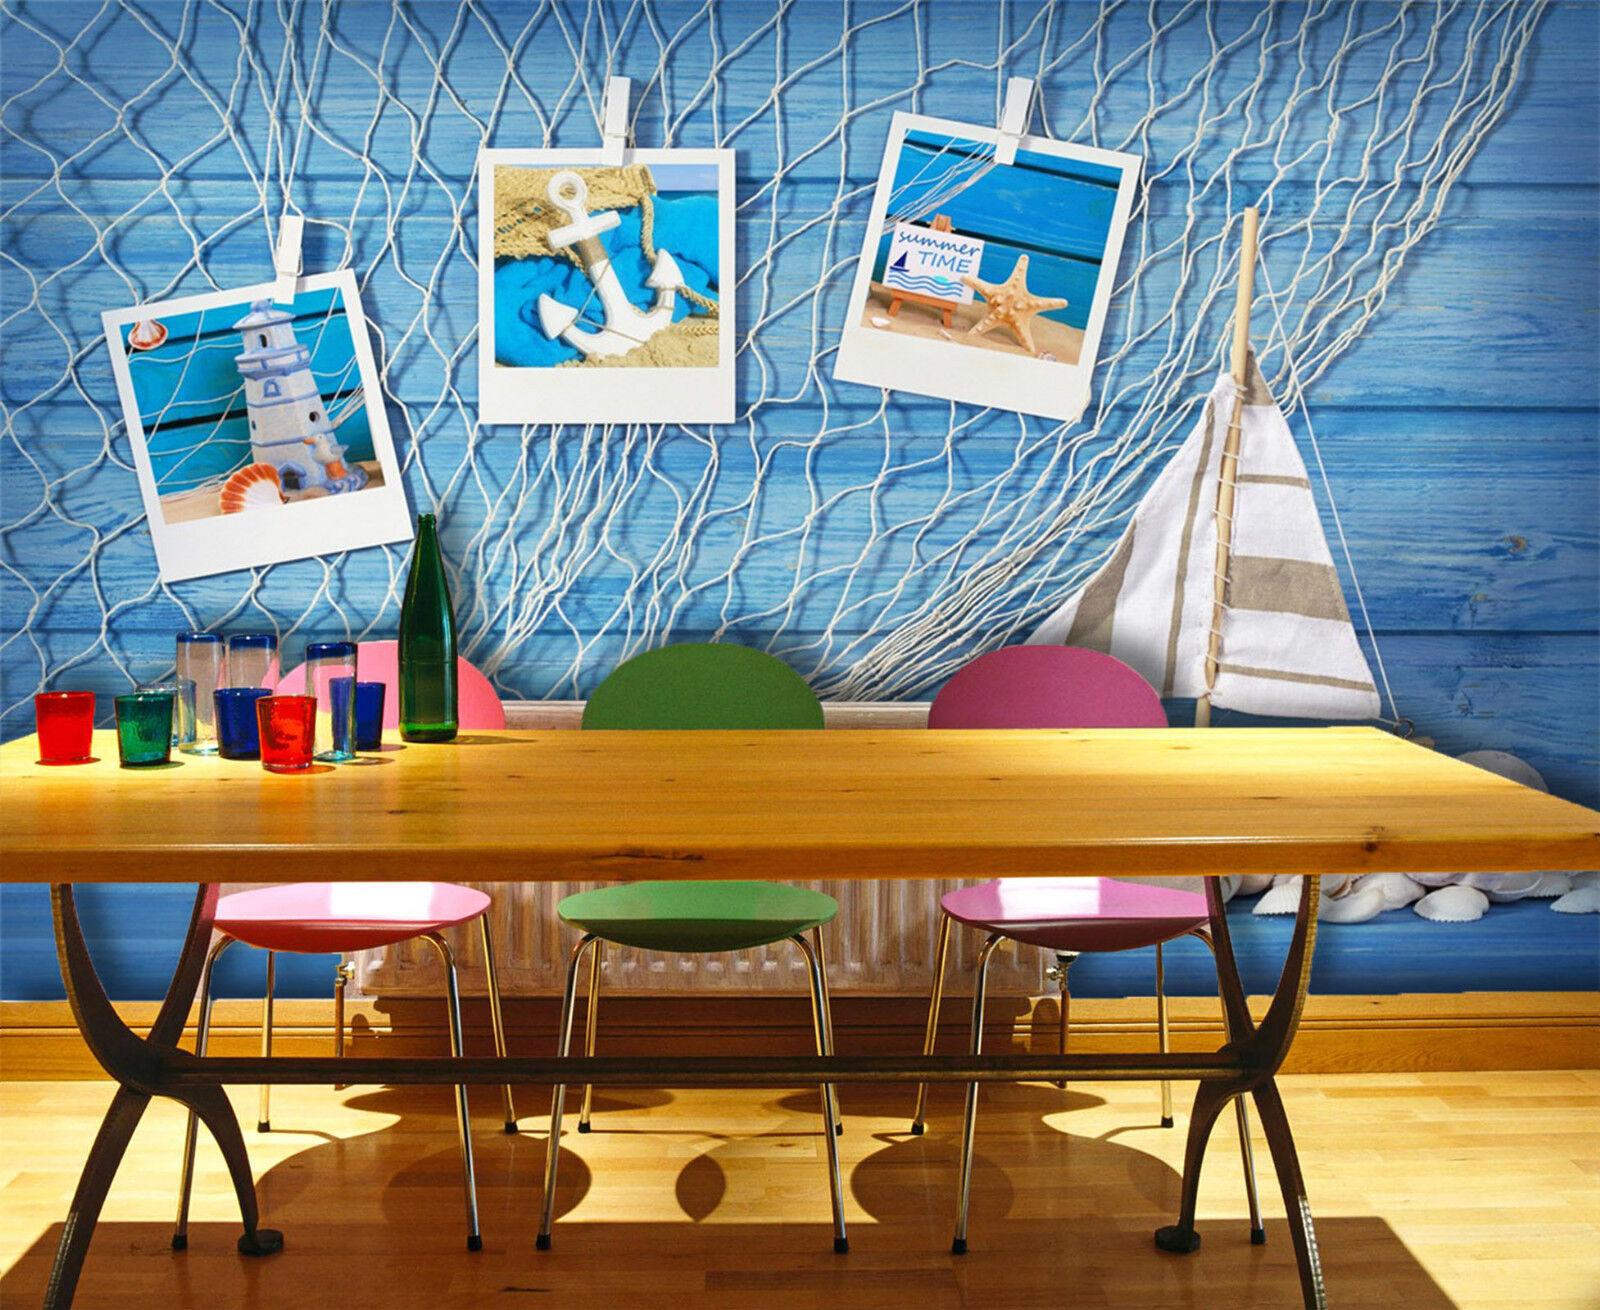 3D Die Mauer 4655 Fototapeten Wandbild Fototapete Bild Tapete Familie Kinder DE